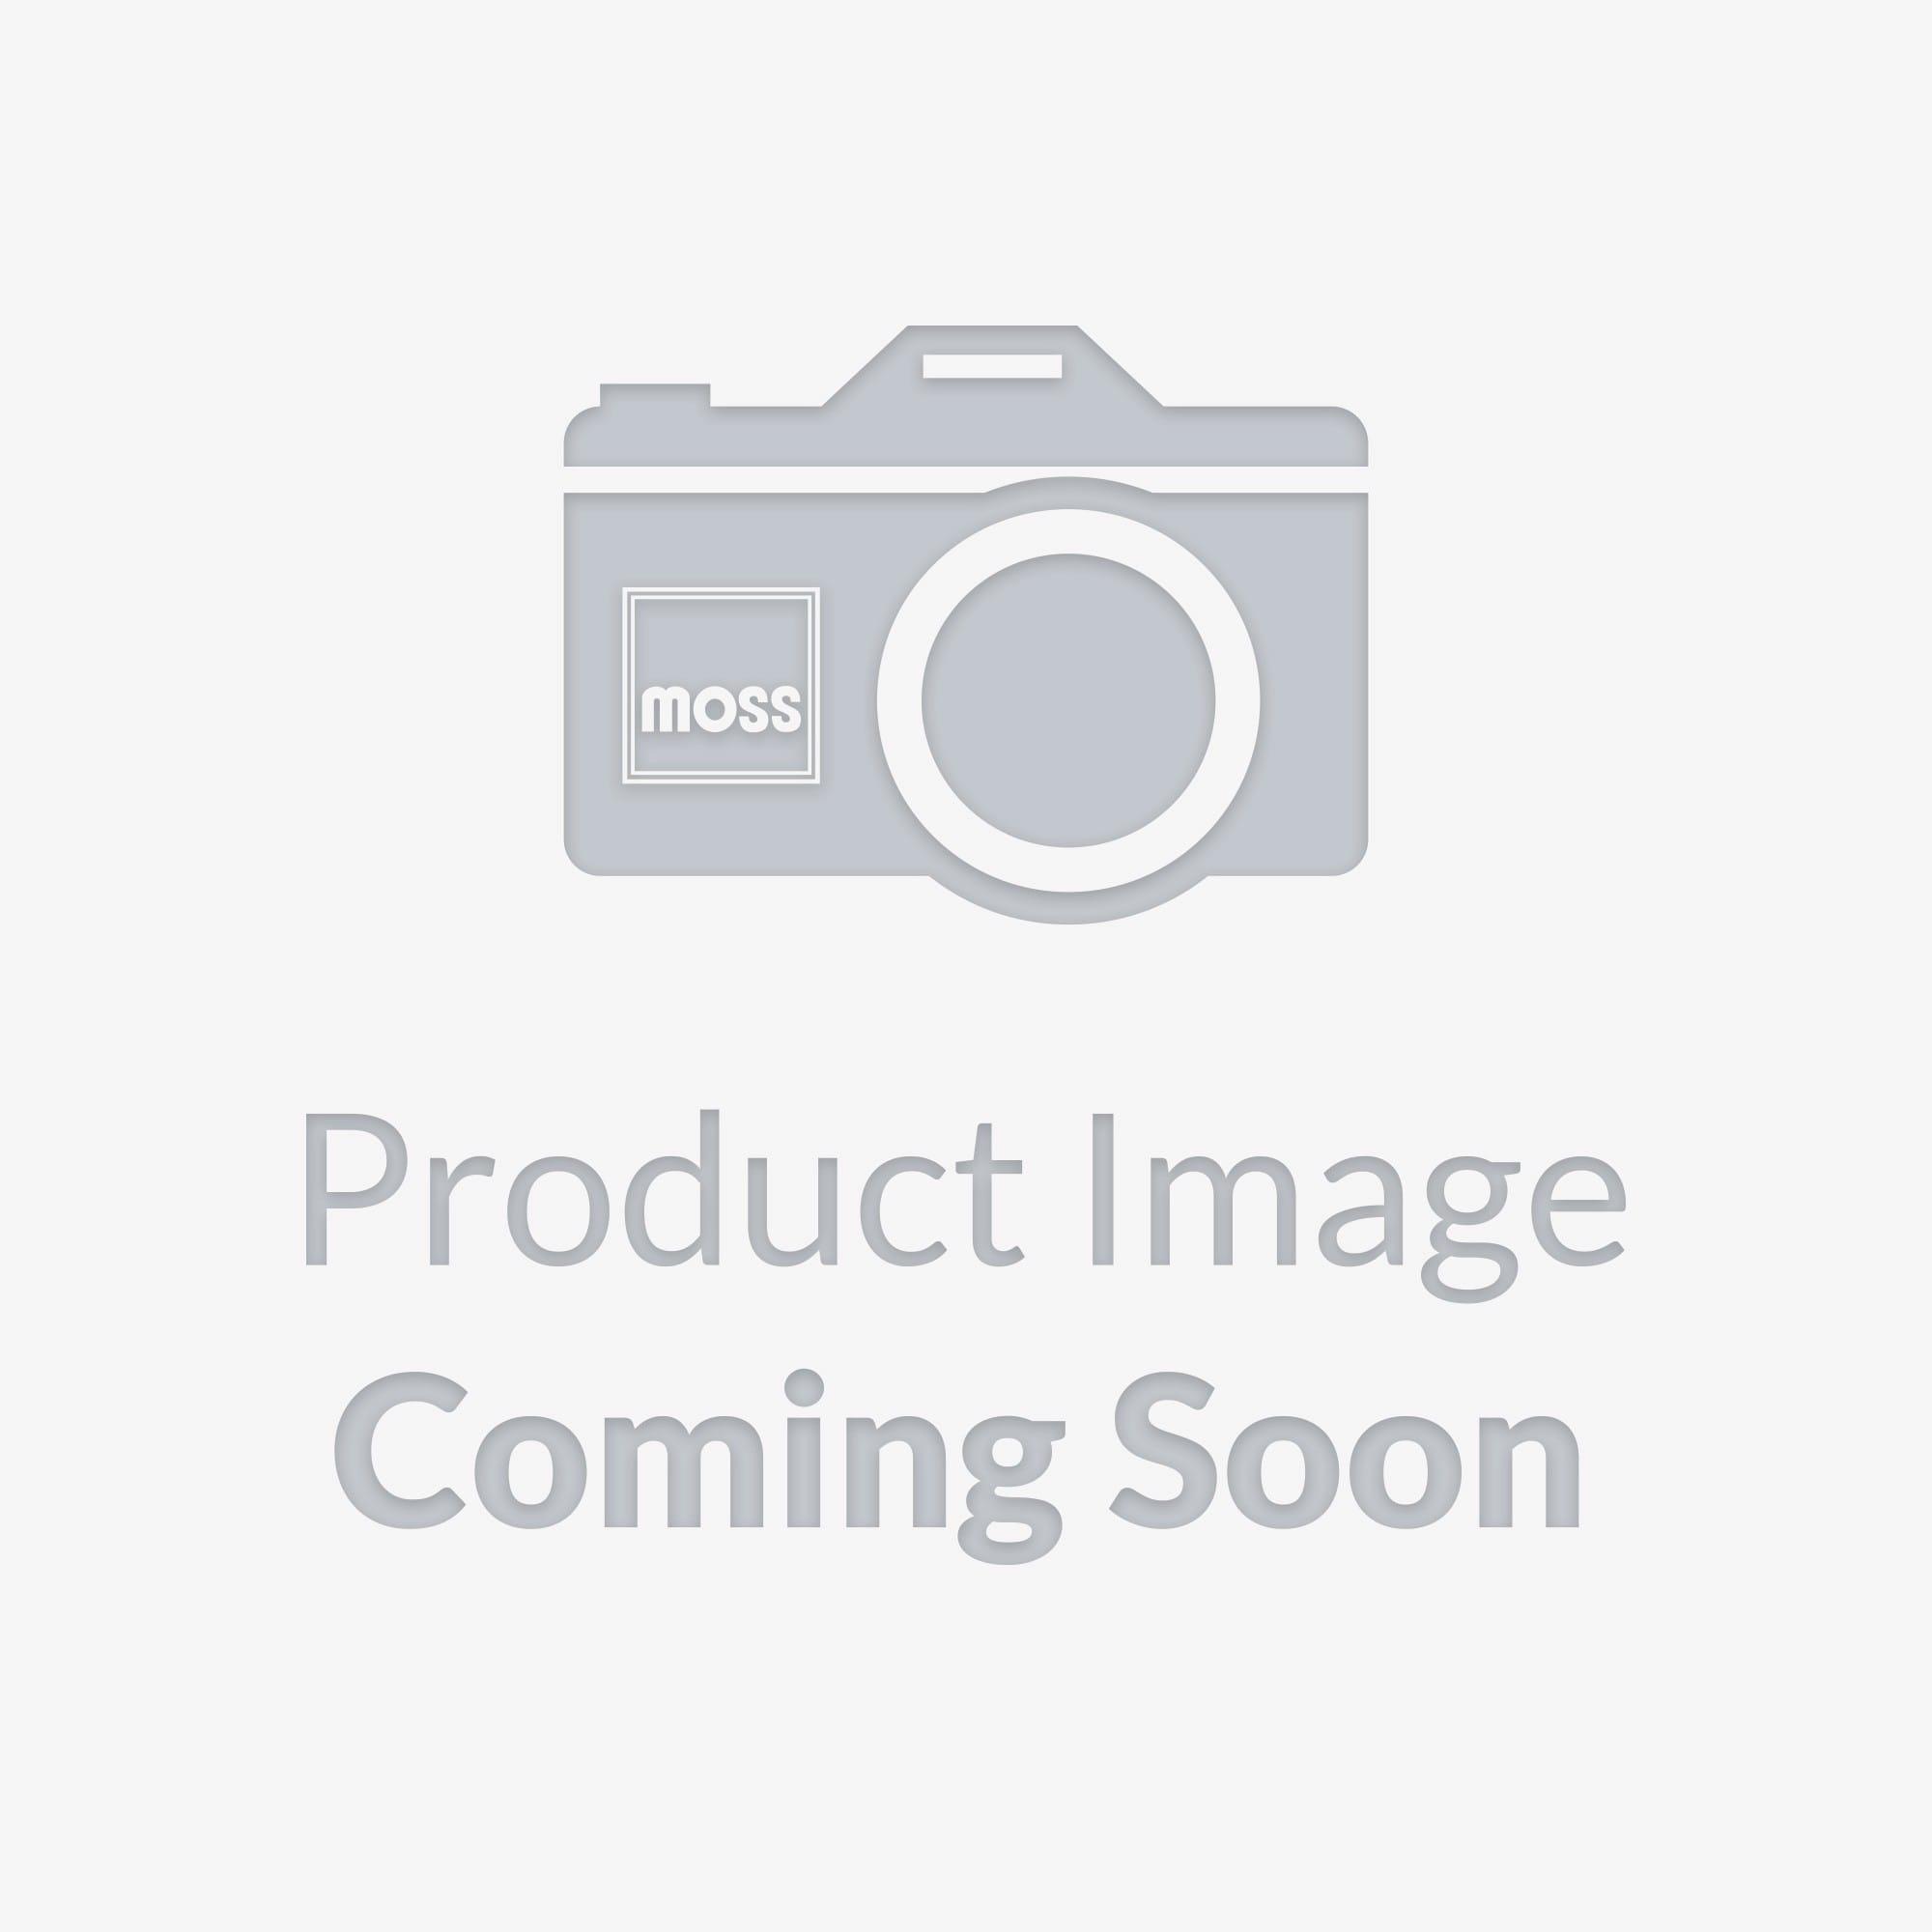 Mg Midget manual electronic ignition